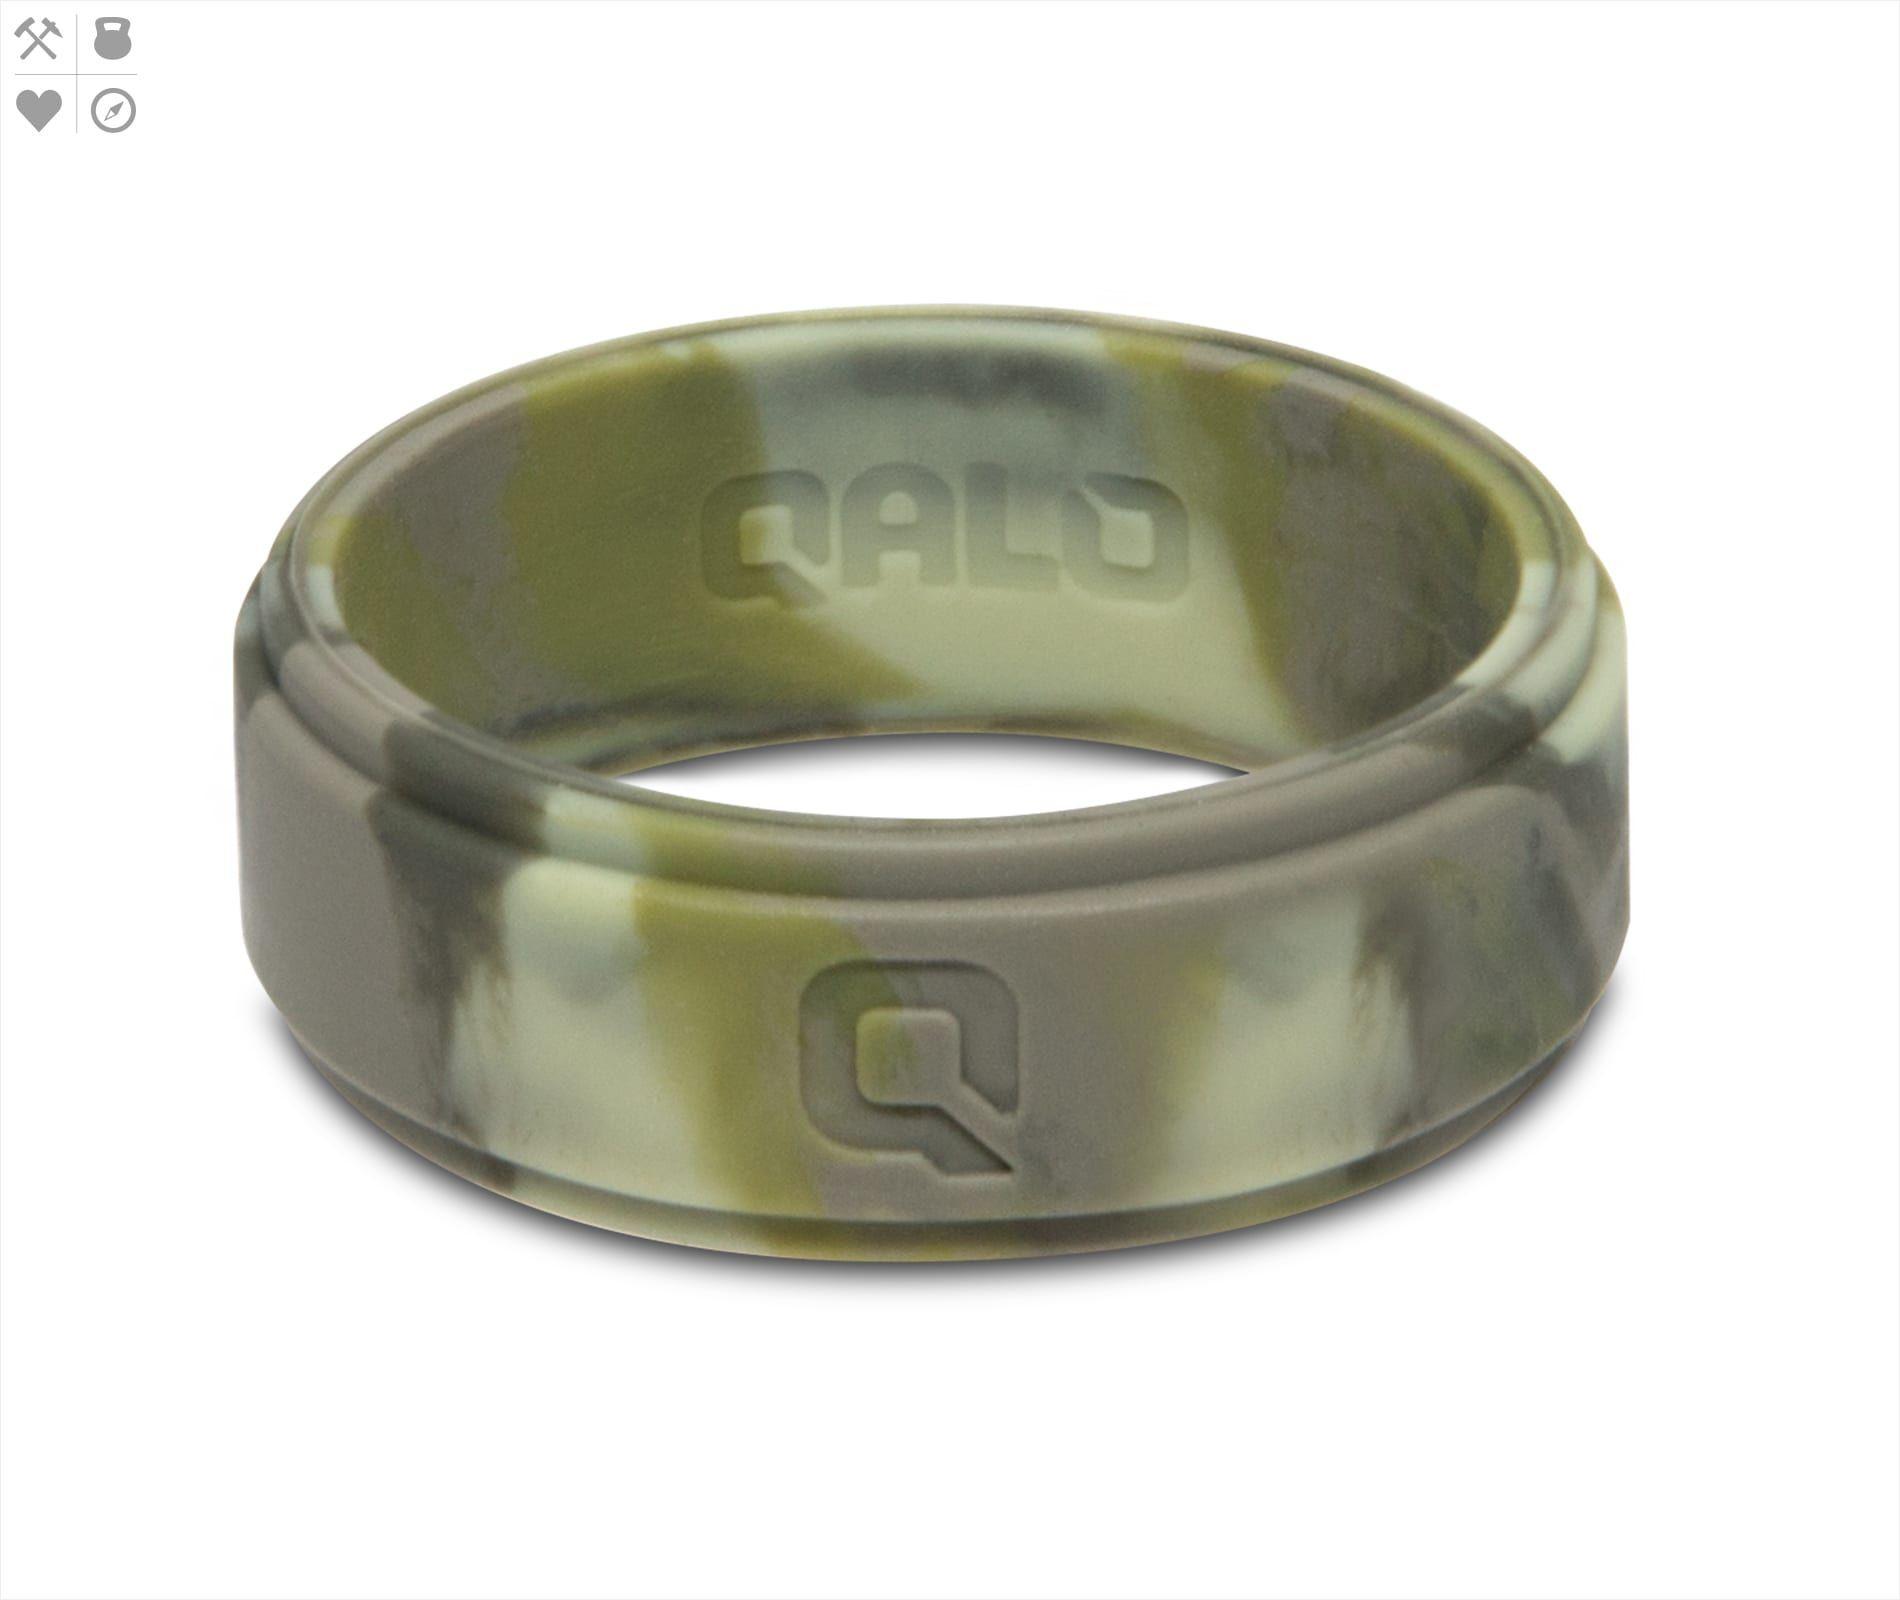 46 luxury silicone wedding bands target go4719 silicone